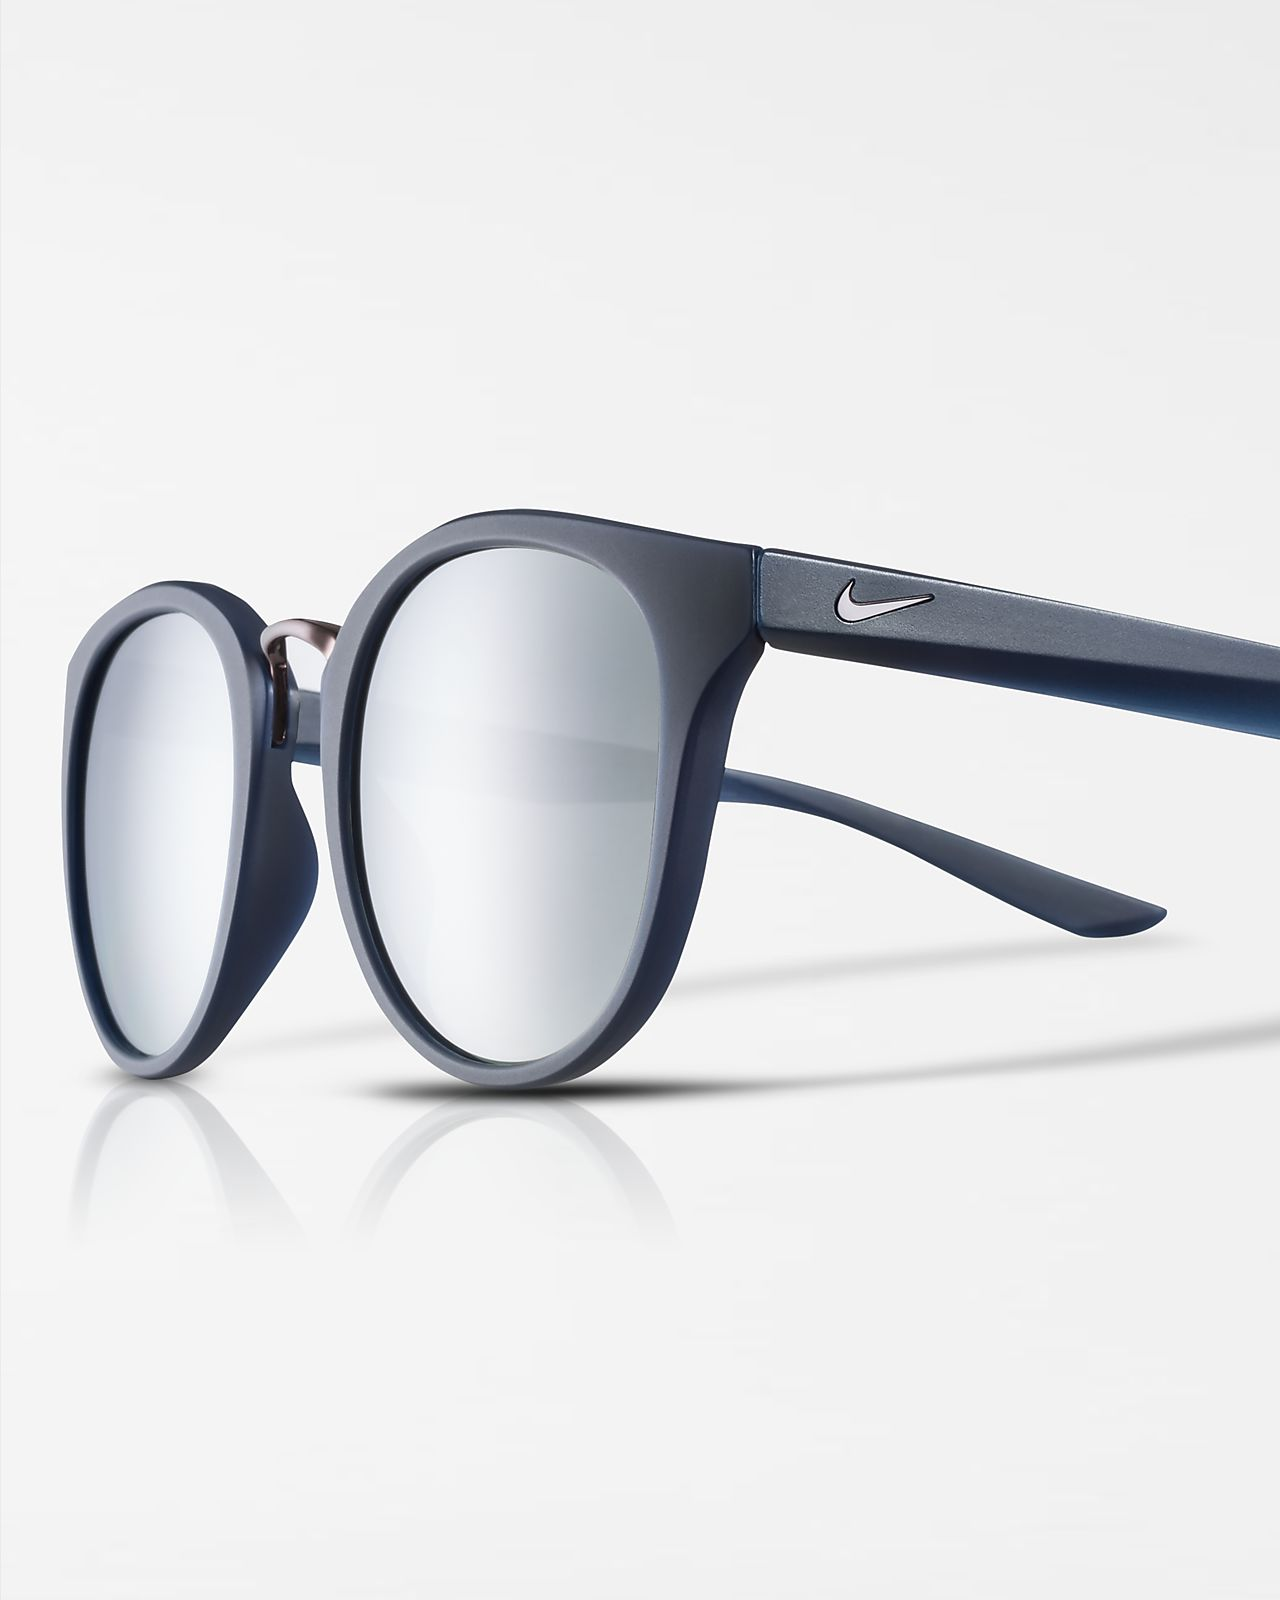 608d26177 Low Resolution Γυαλιά ηλίου Nike Revere Mirrored Γυαλιά ηλίου Nike Revere  Mirrored